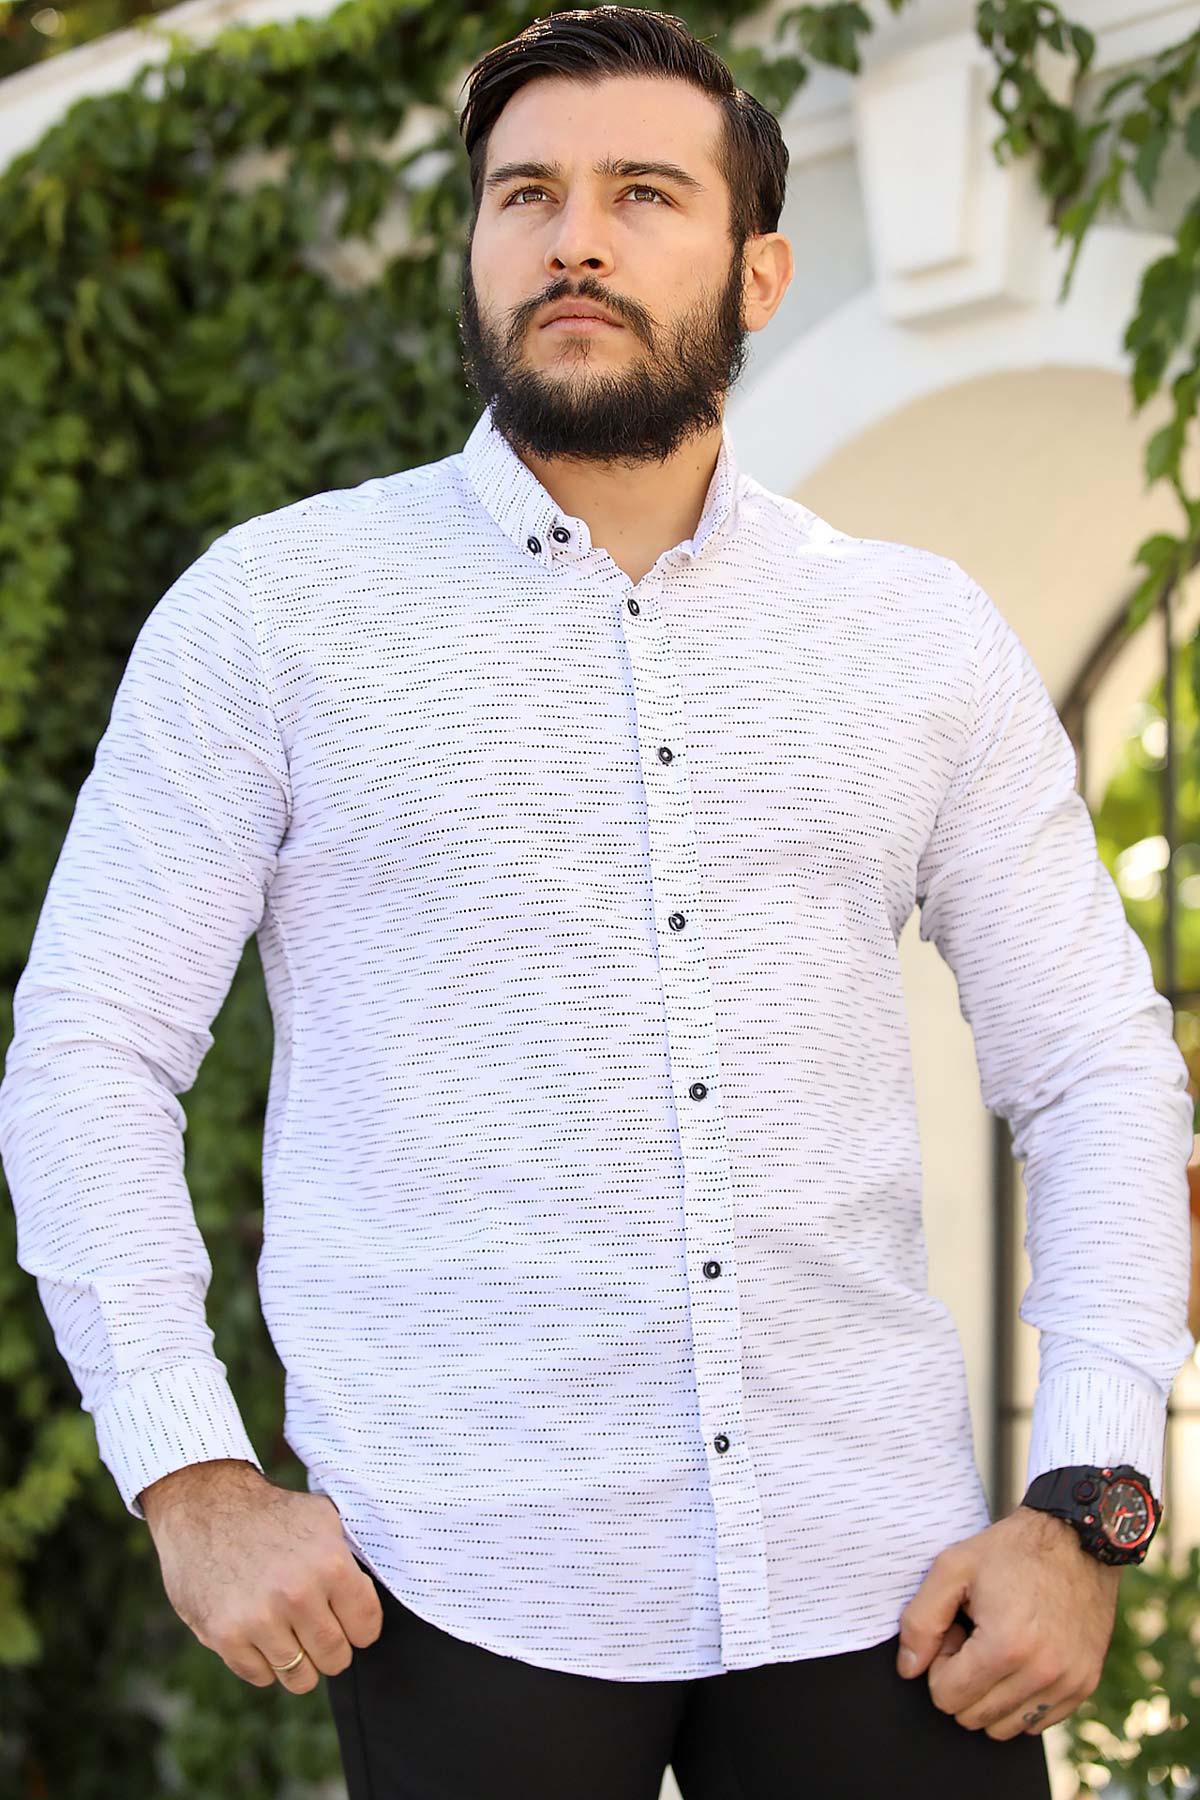 Men's Oversize Patterned Ecru Shirt